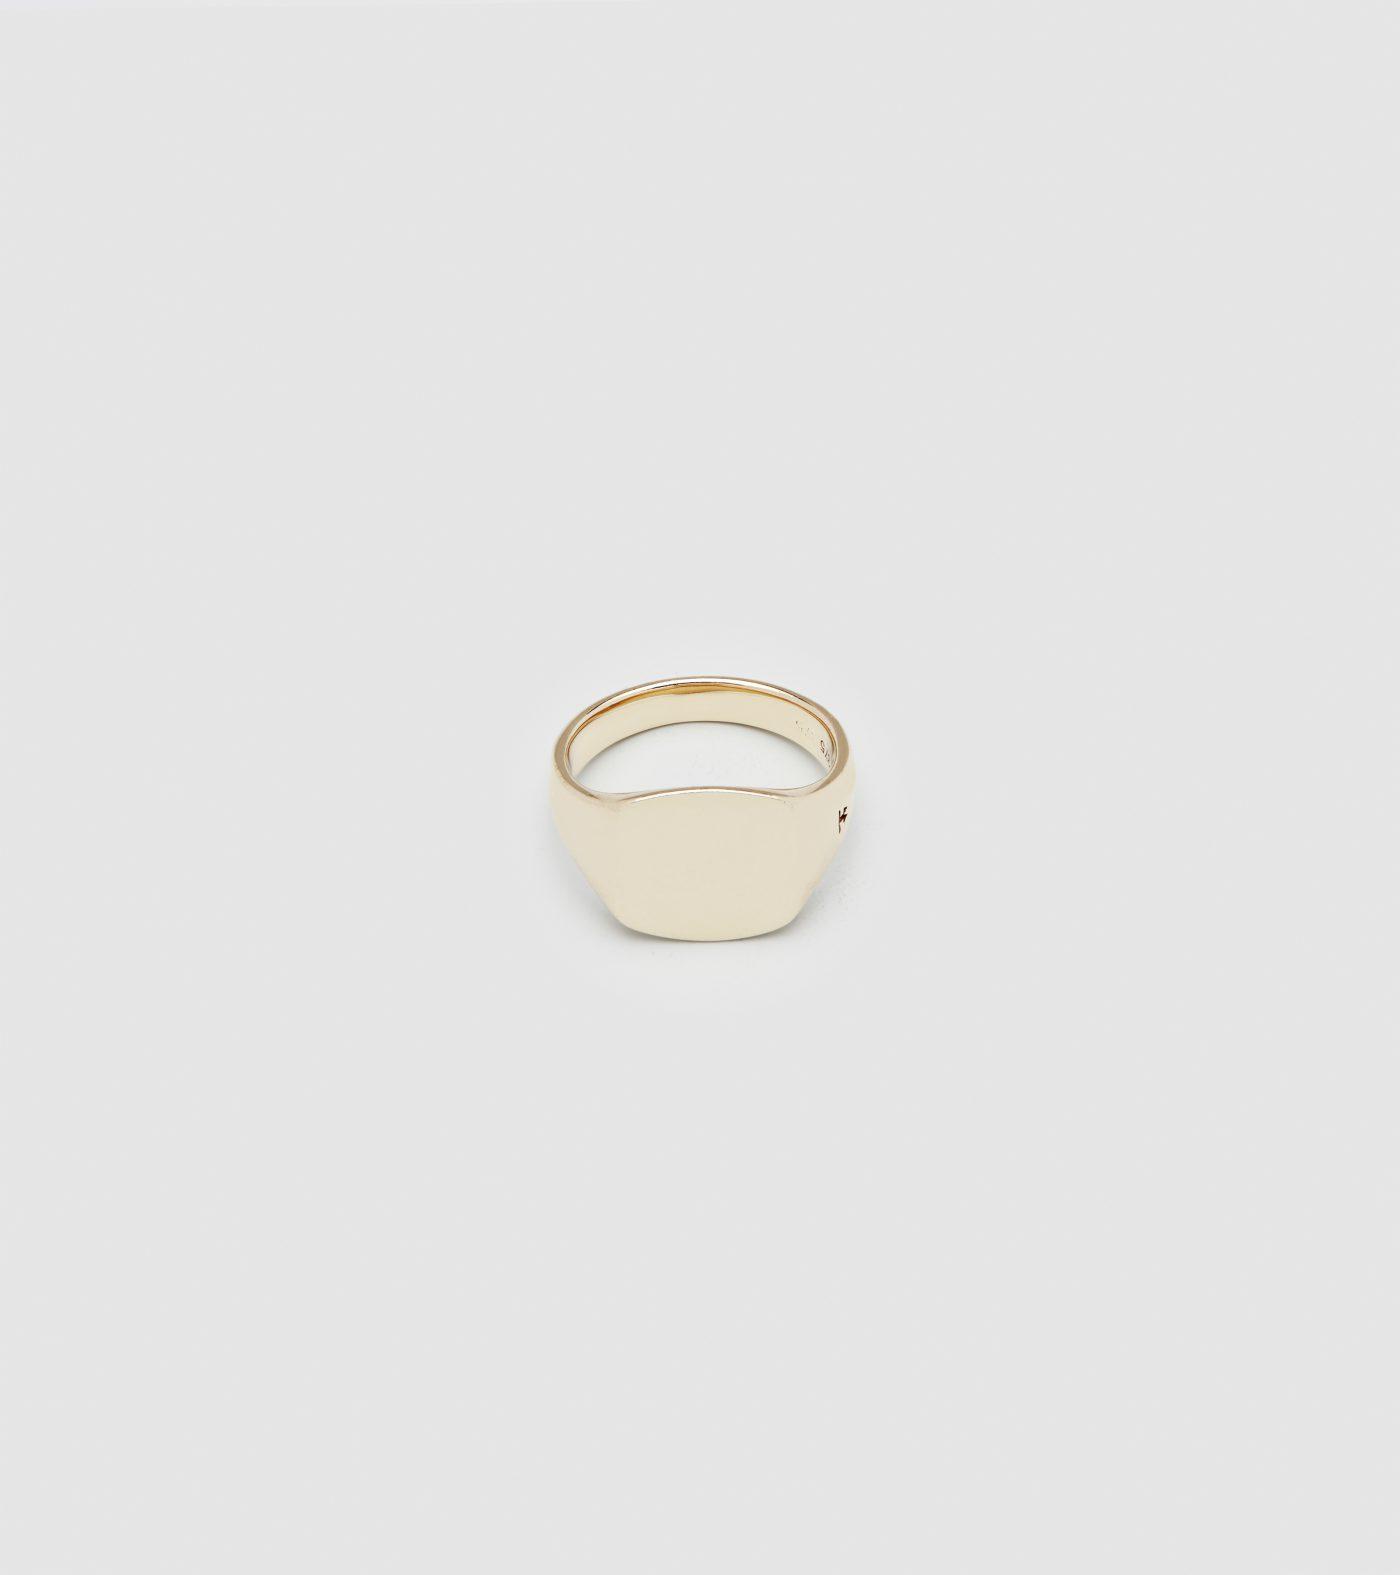 Tom_Wood_Mini_Cushion_Gold_Ring_Rika_Studios